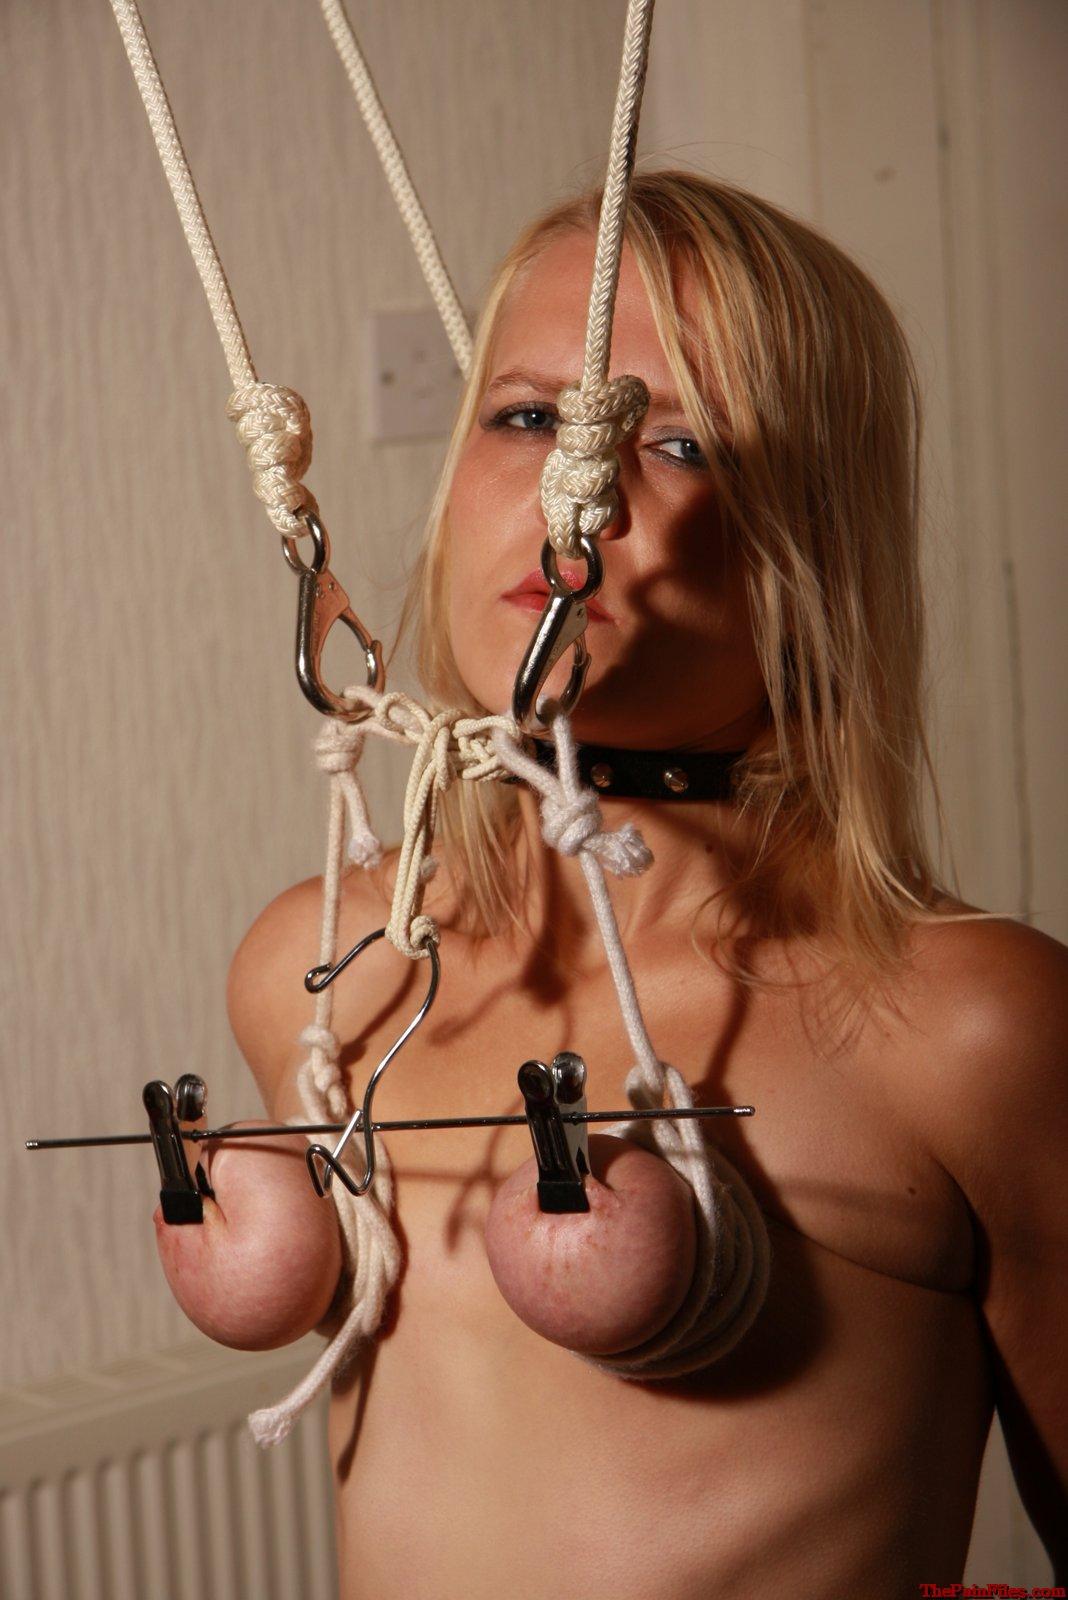 Homemade bdsm breast harness